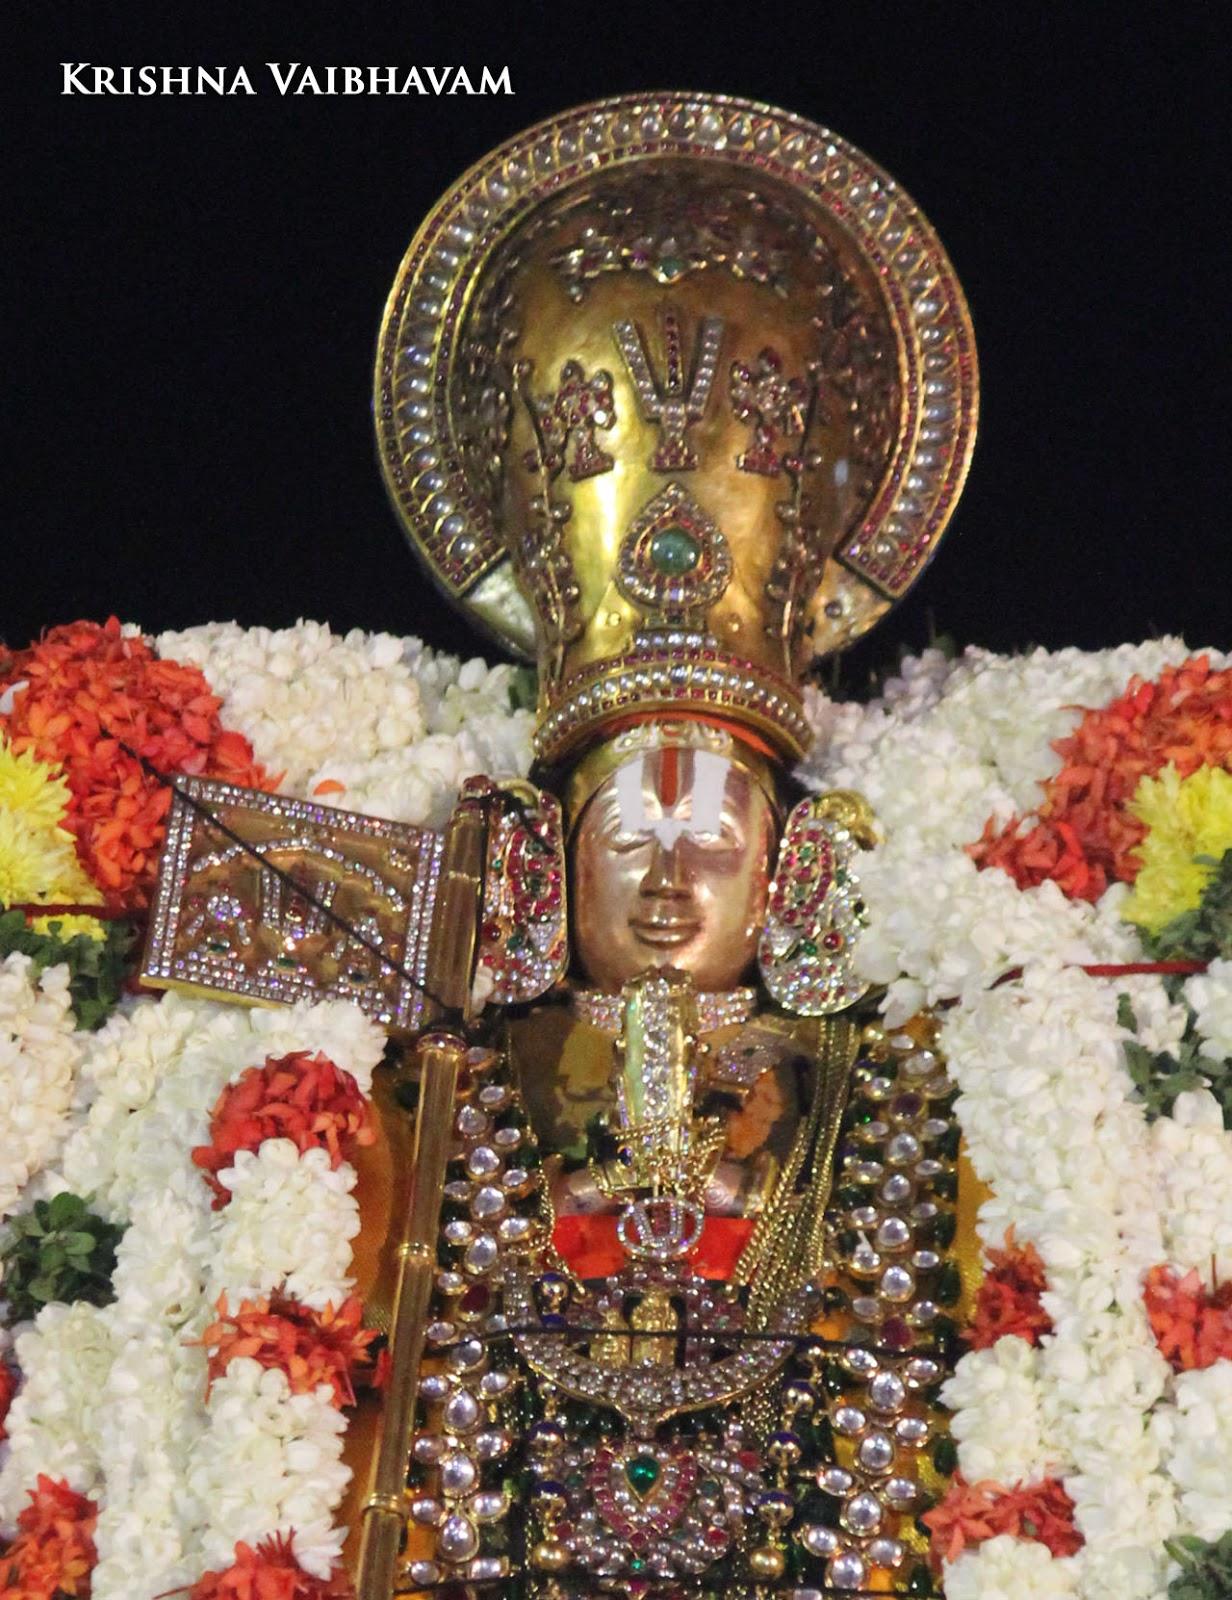 Paramavatar Shri Krishna Video Download